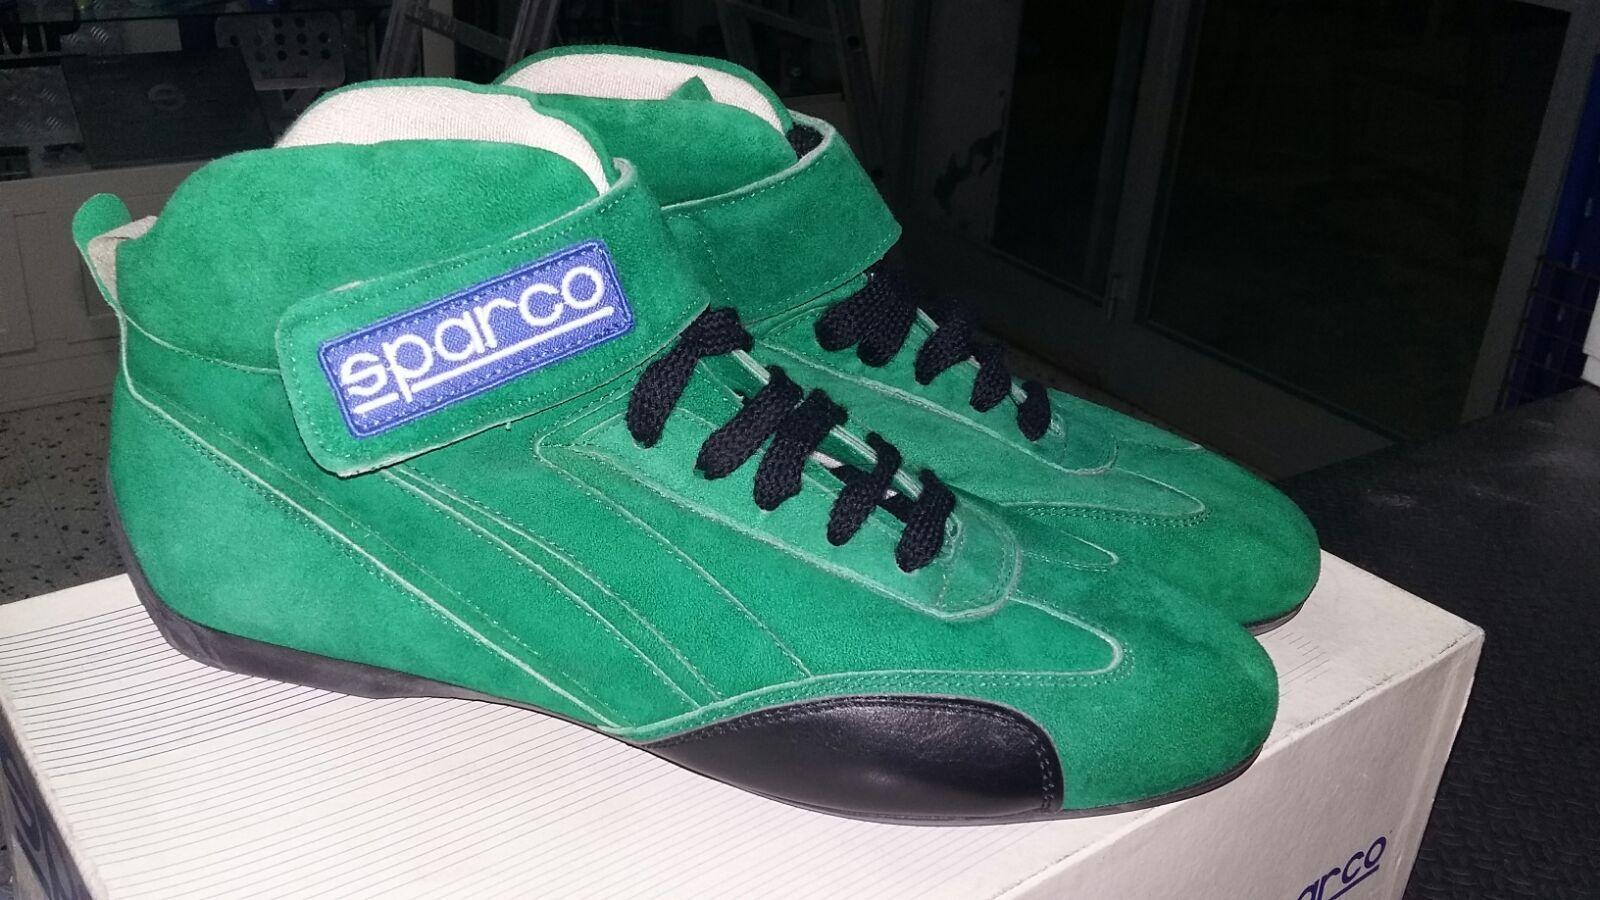 Chaussures SPARCO OMOLOGAZIONE SCADUTA IGNIFUGHE PER GARE UISP O KART TAGLIA 40 USED